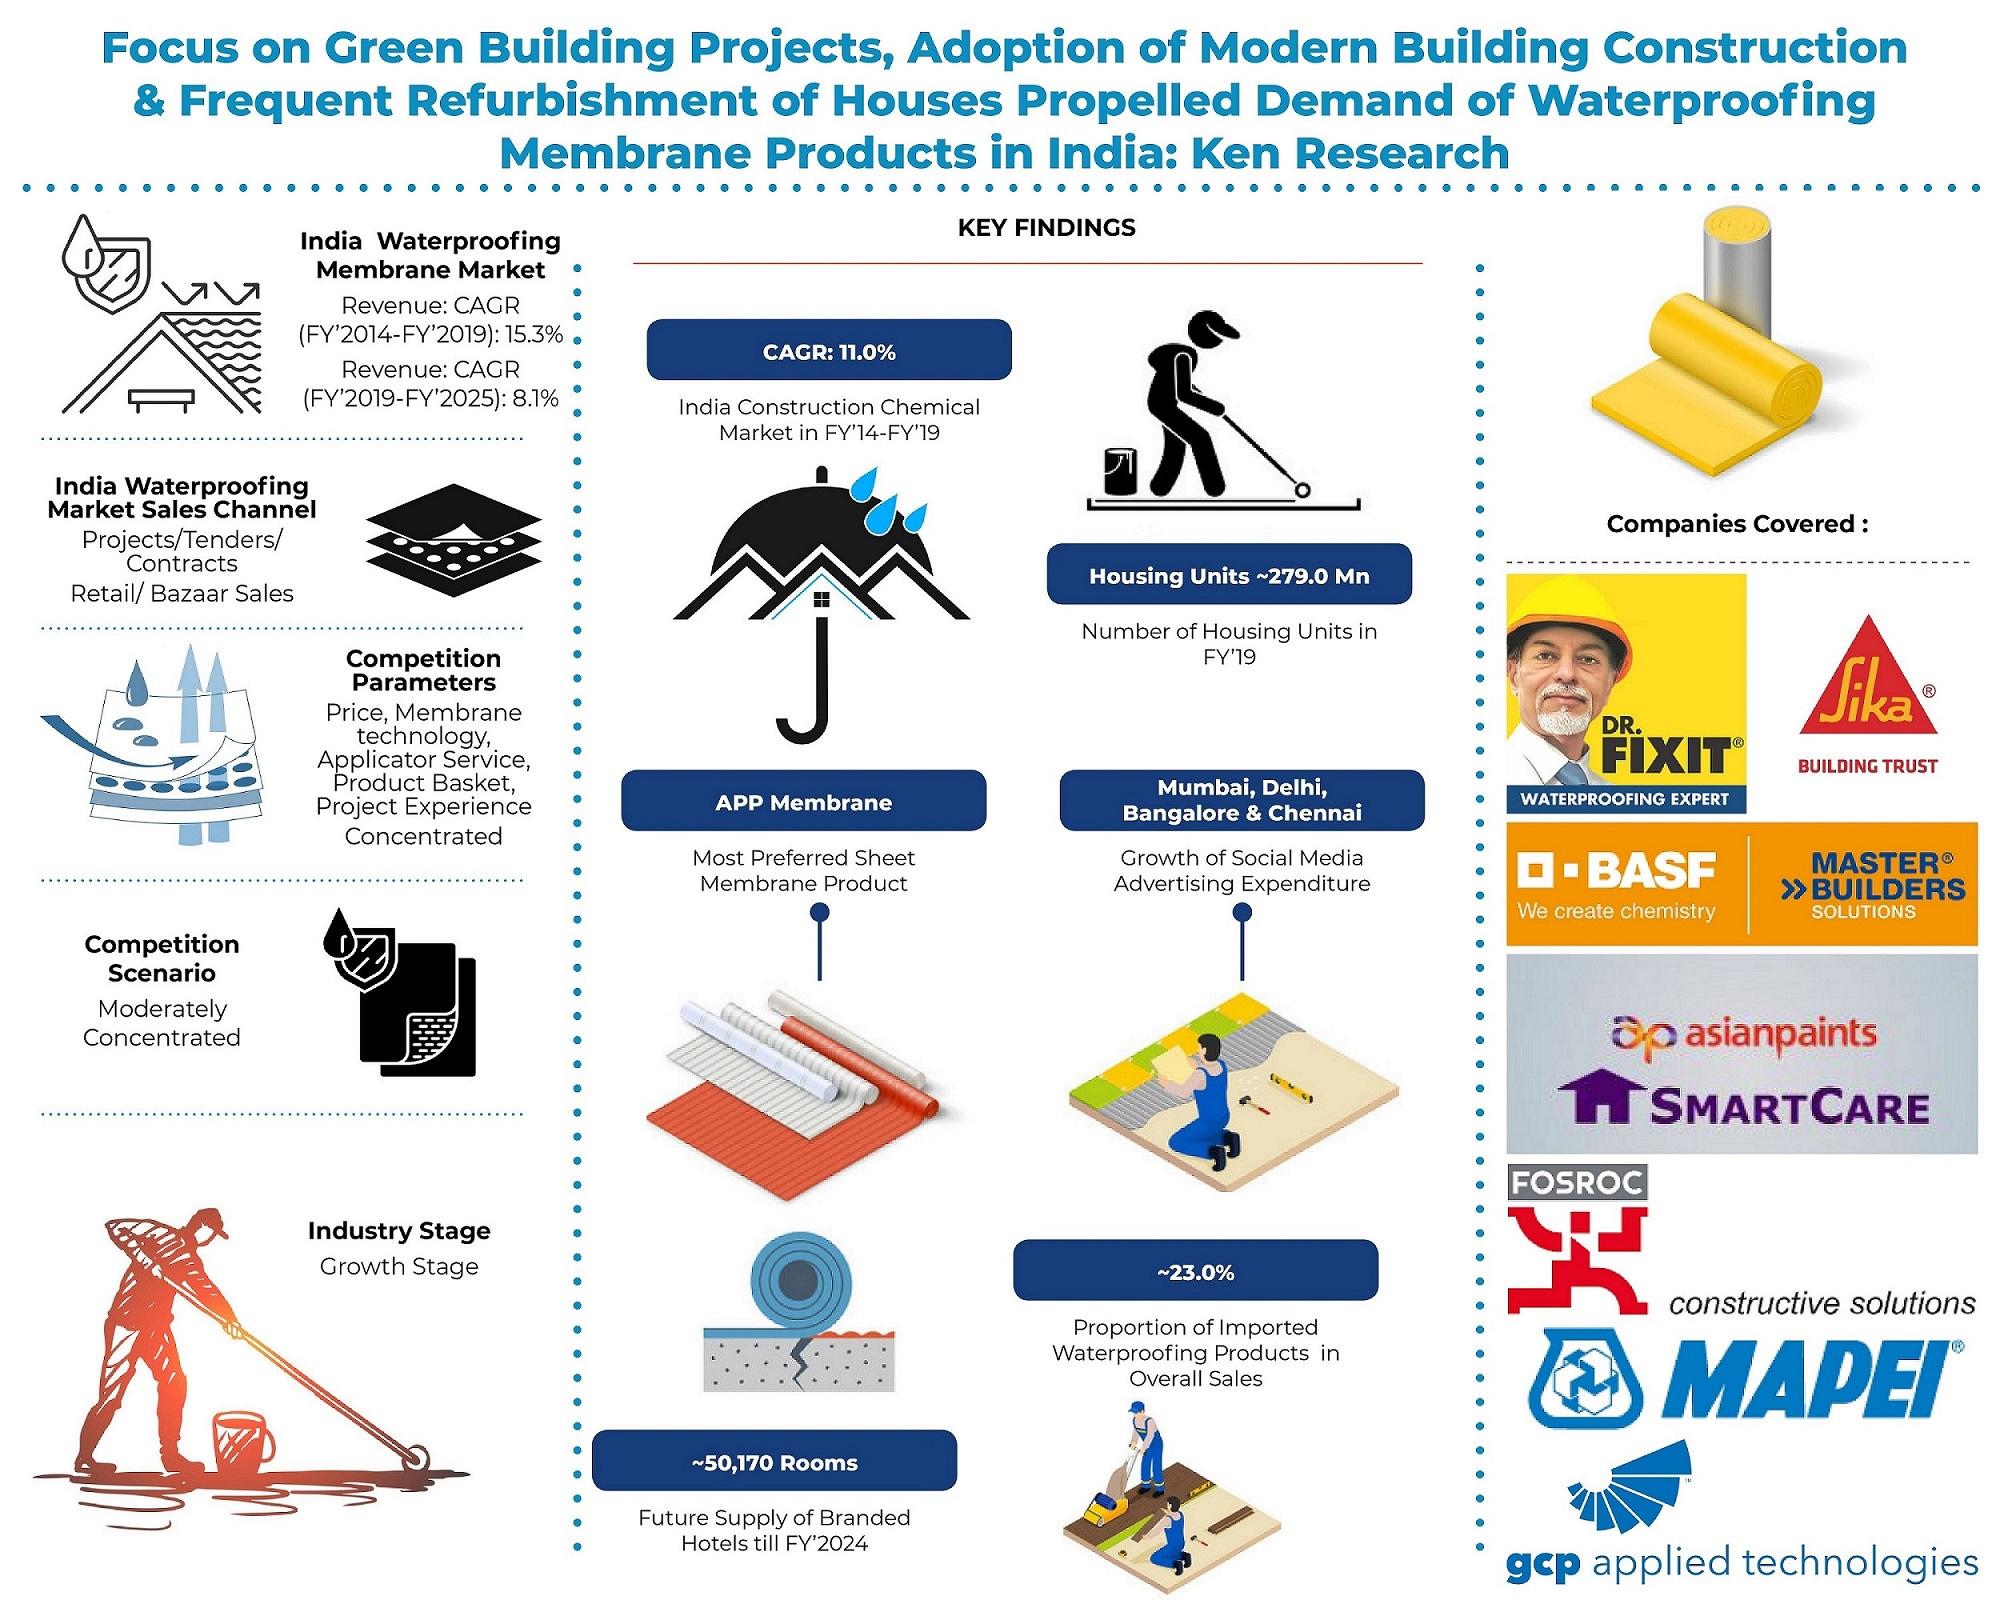 india-waterproofing-membrane-market